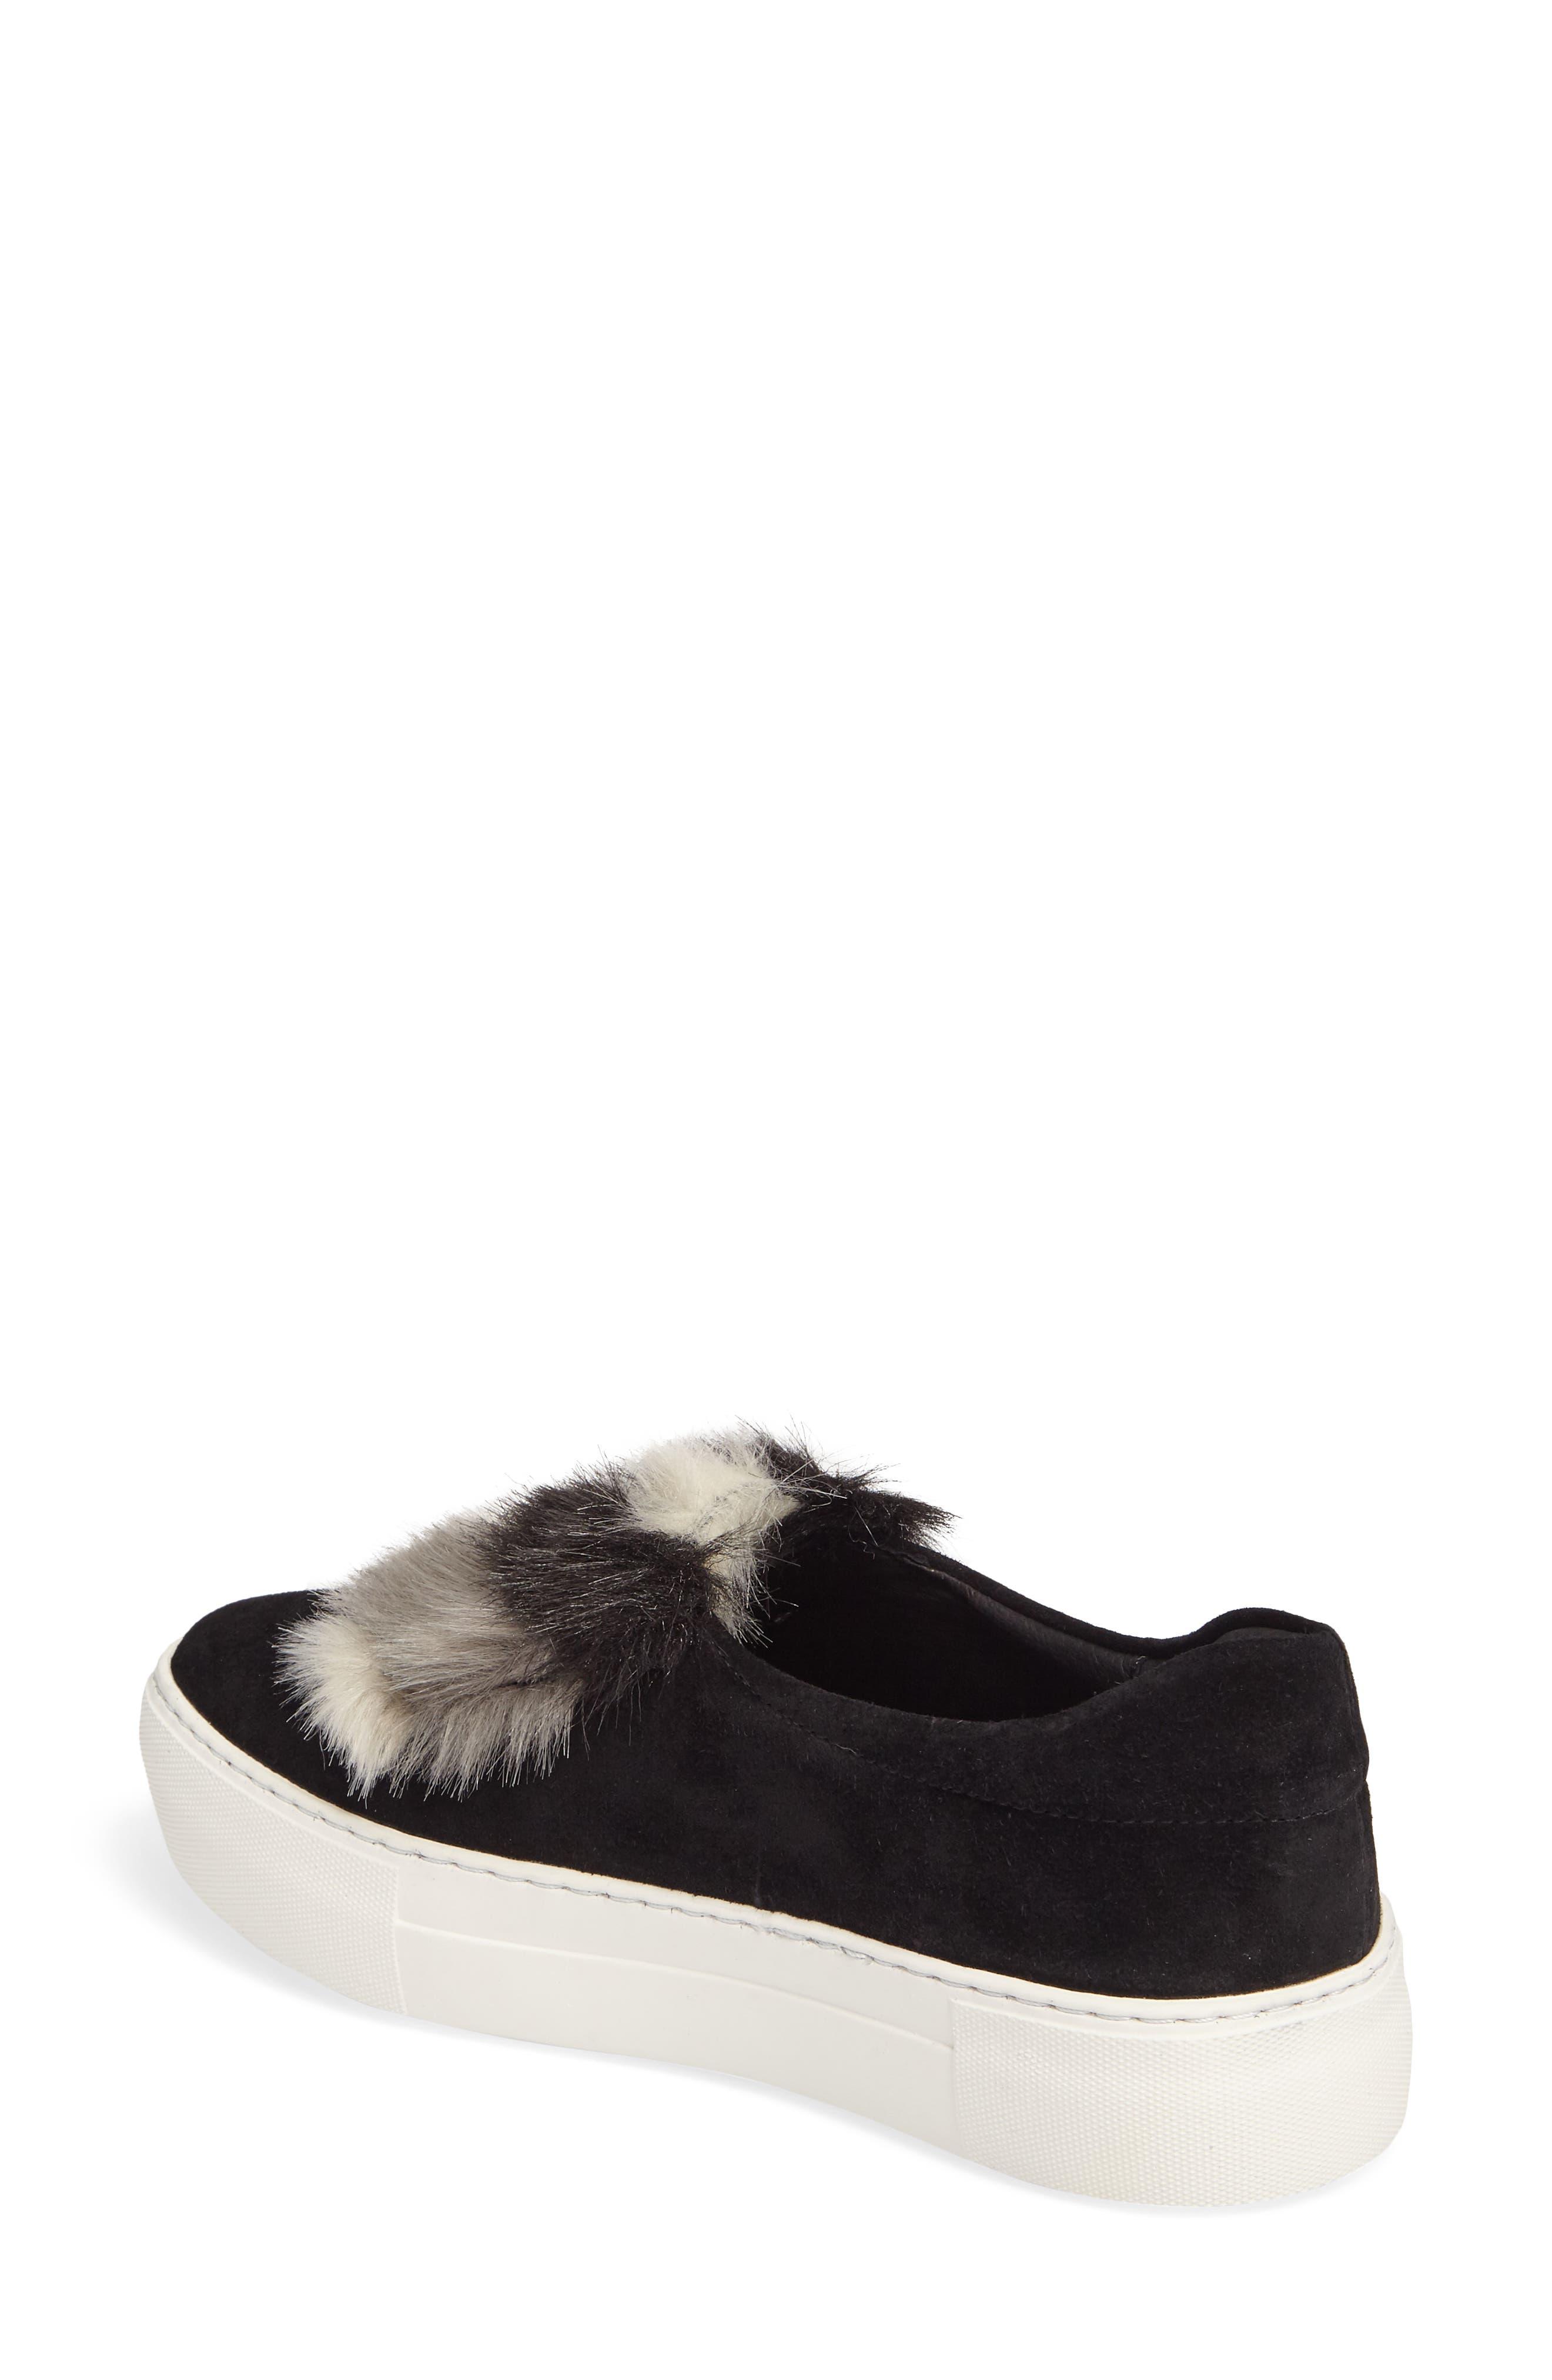 JSLIDES,                             Alexi Faux Fur Slip-On Sneaker,                             Alternate thumbnail 2, color,                             002